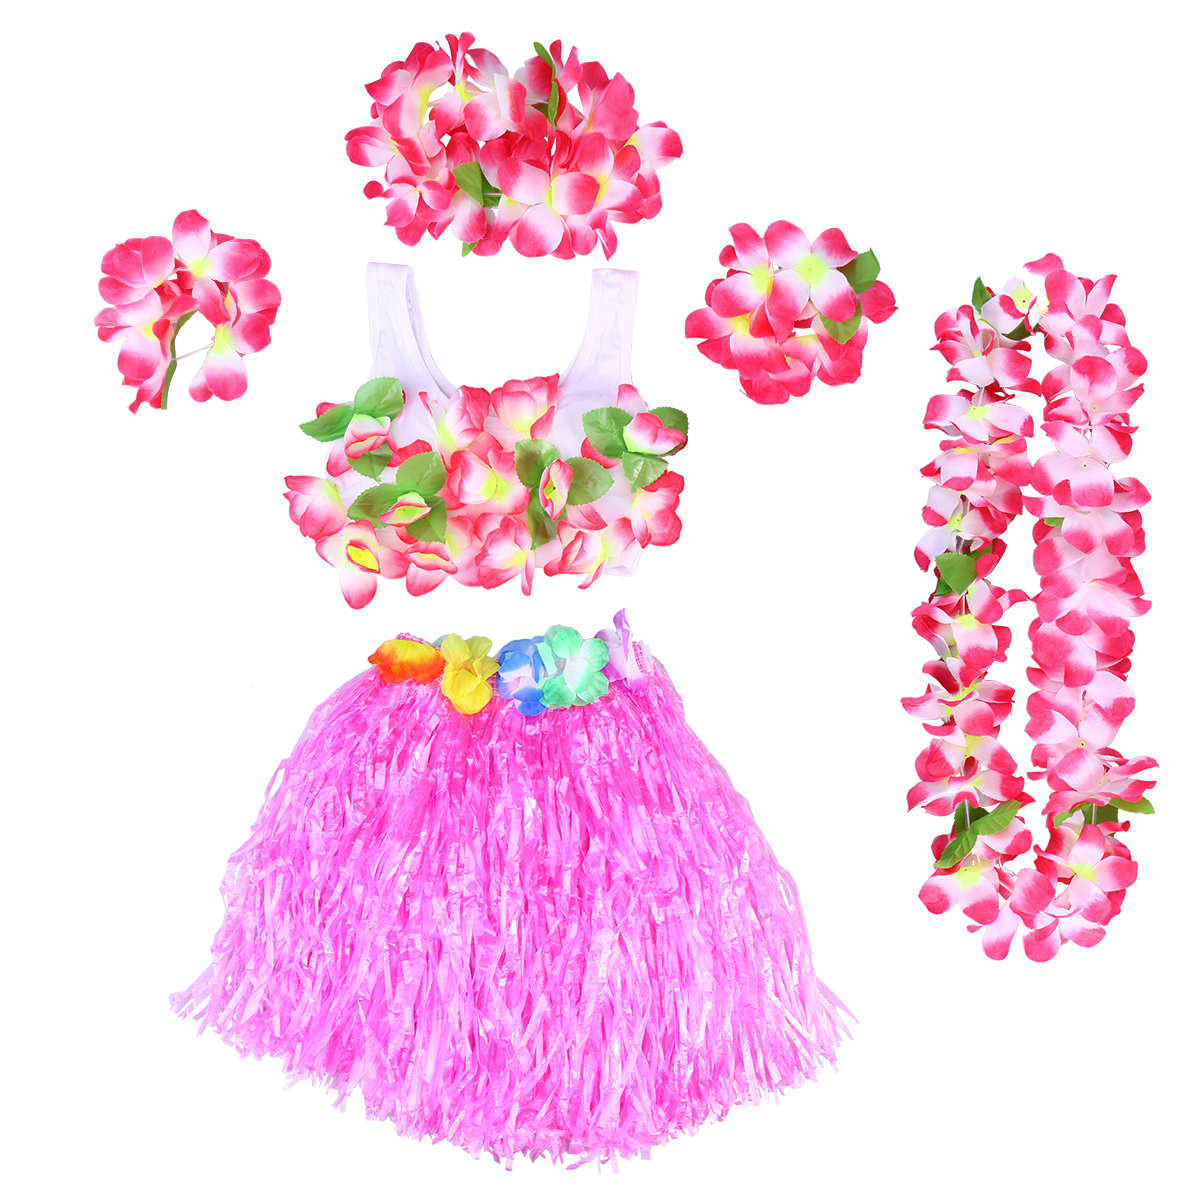 4 pcs//set Hawaiian Tropical Hula Luau Grass Dance Head Neck Wrist Garland  HI